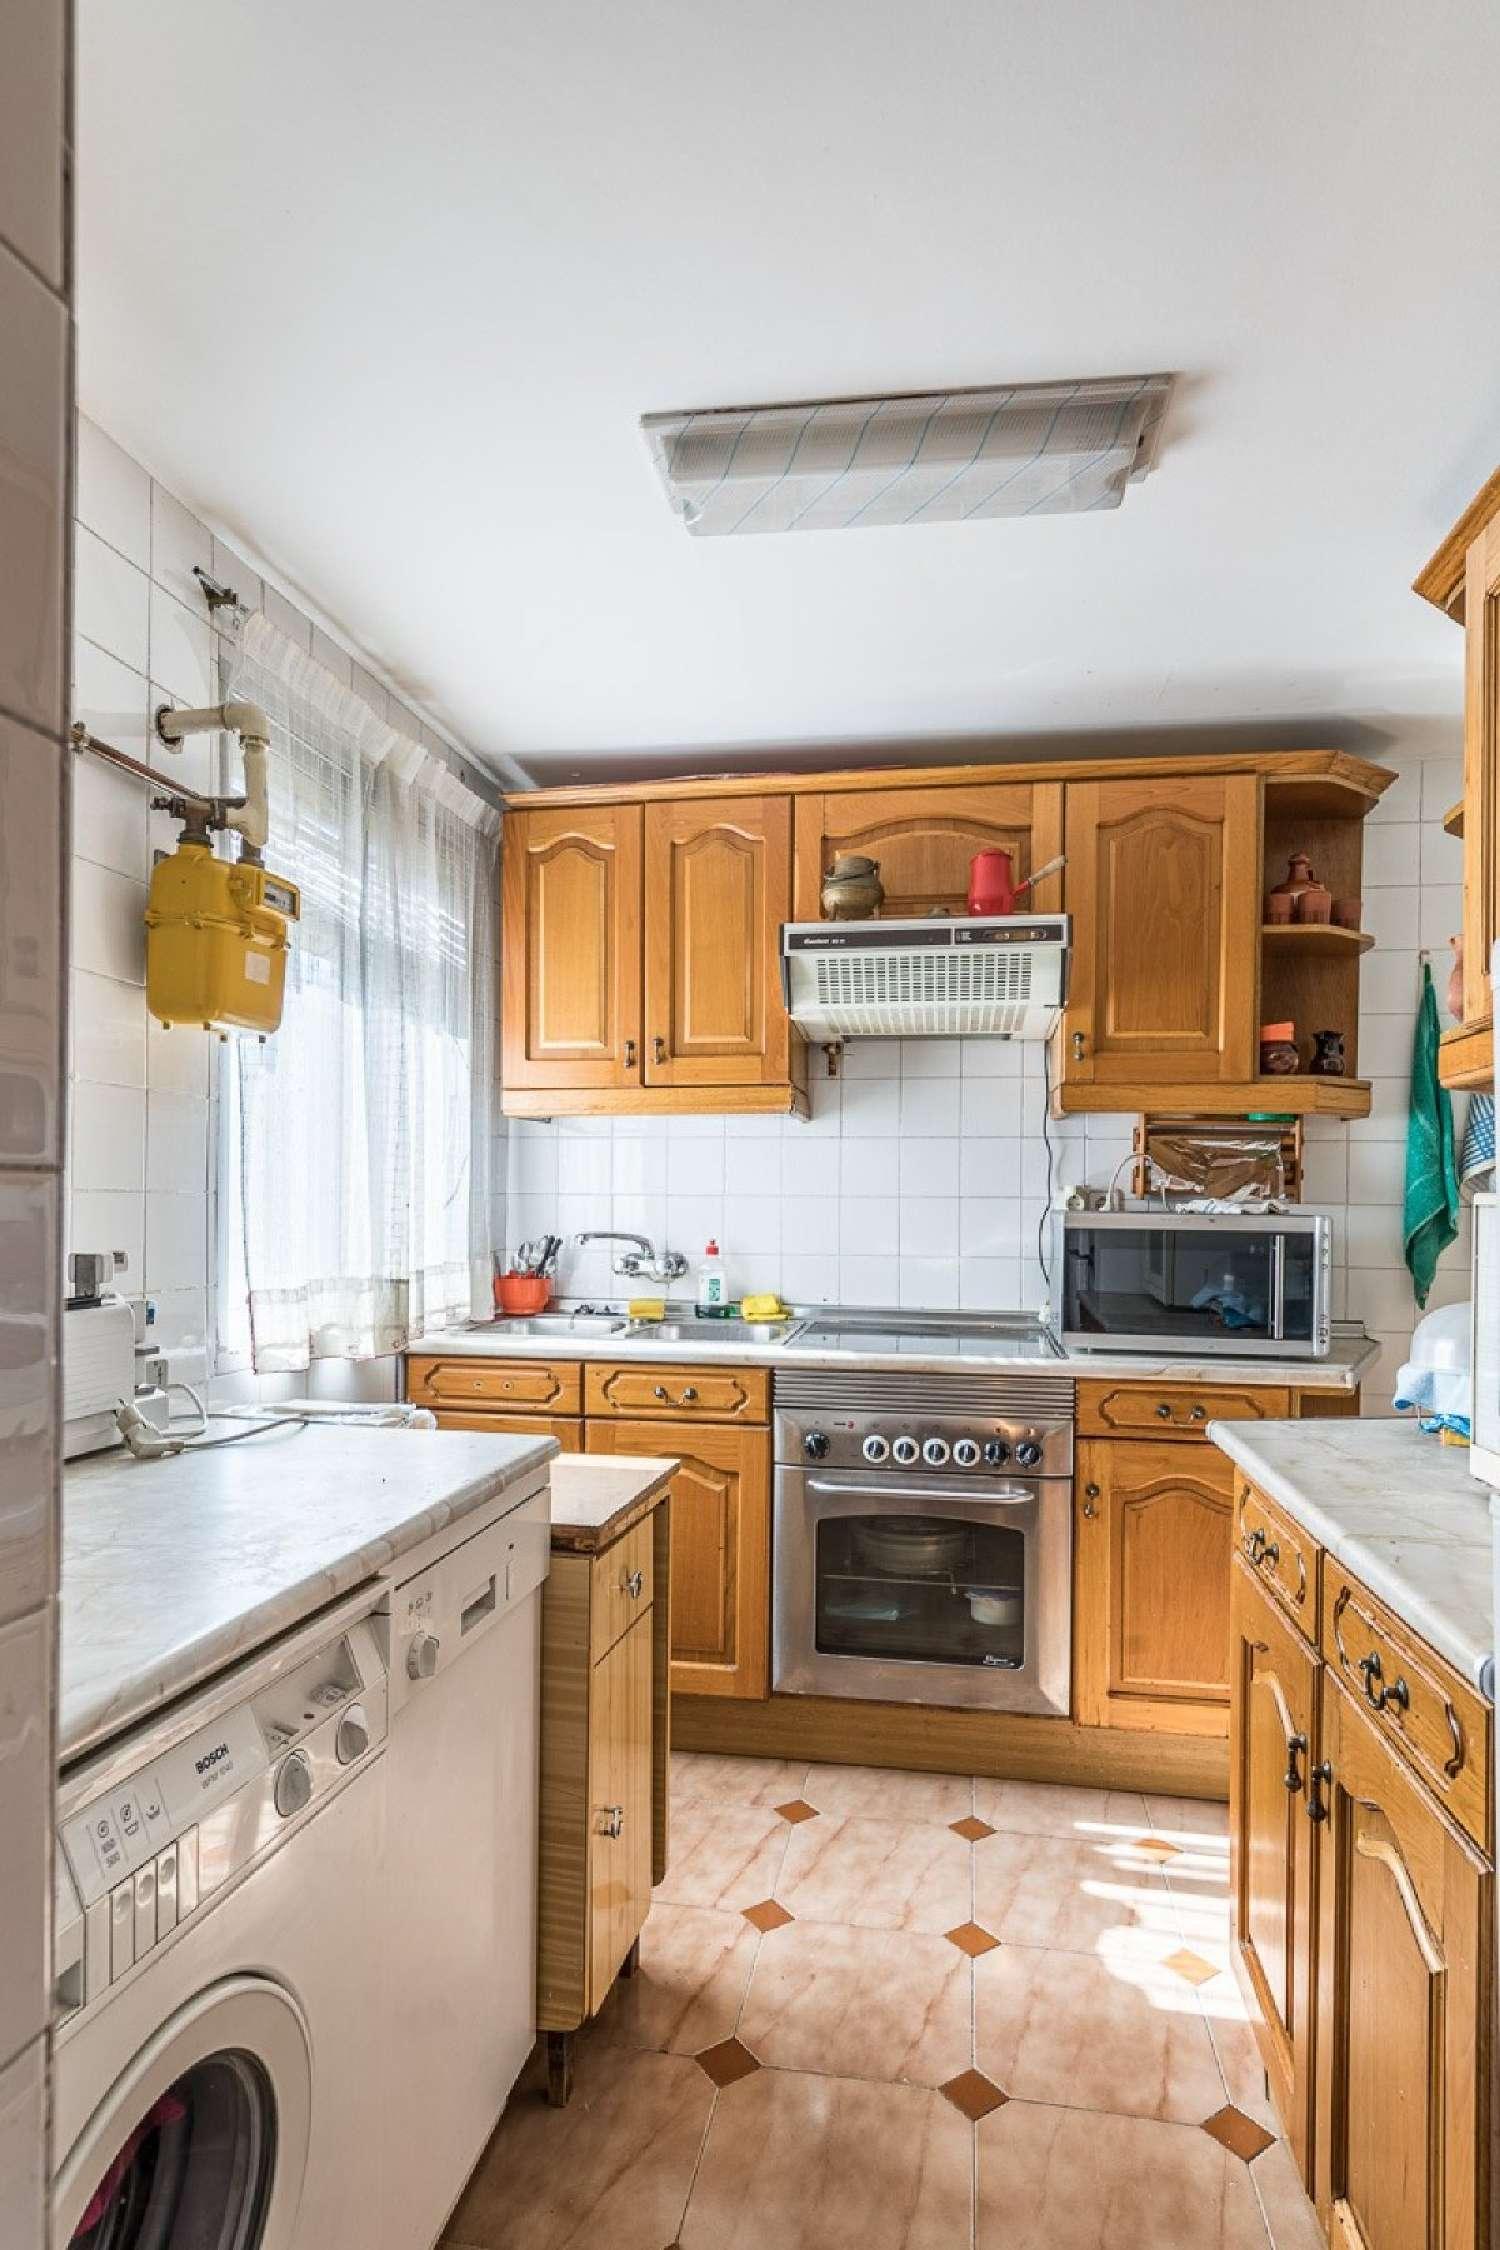 fuencarral-mirasierra madrid piso foto 4061204